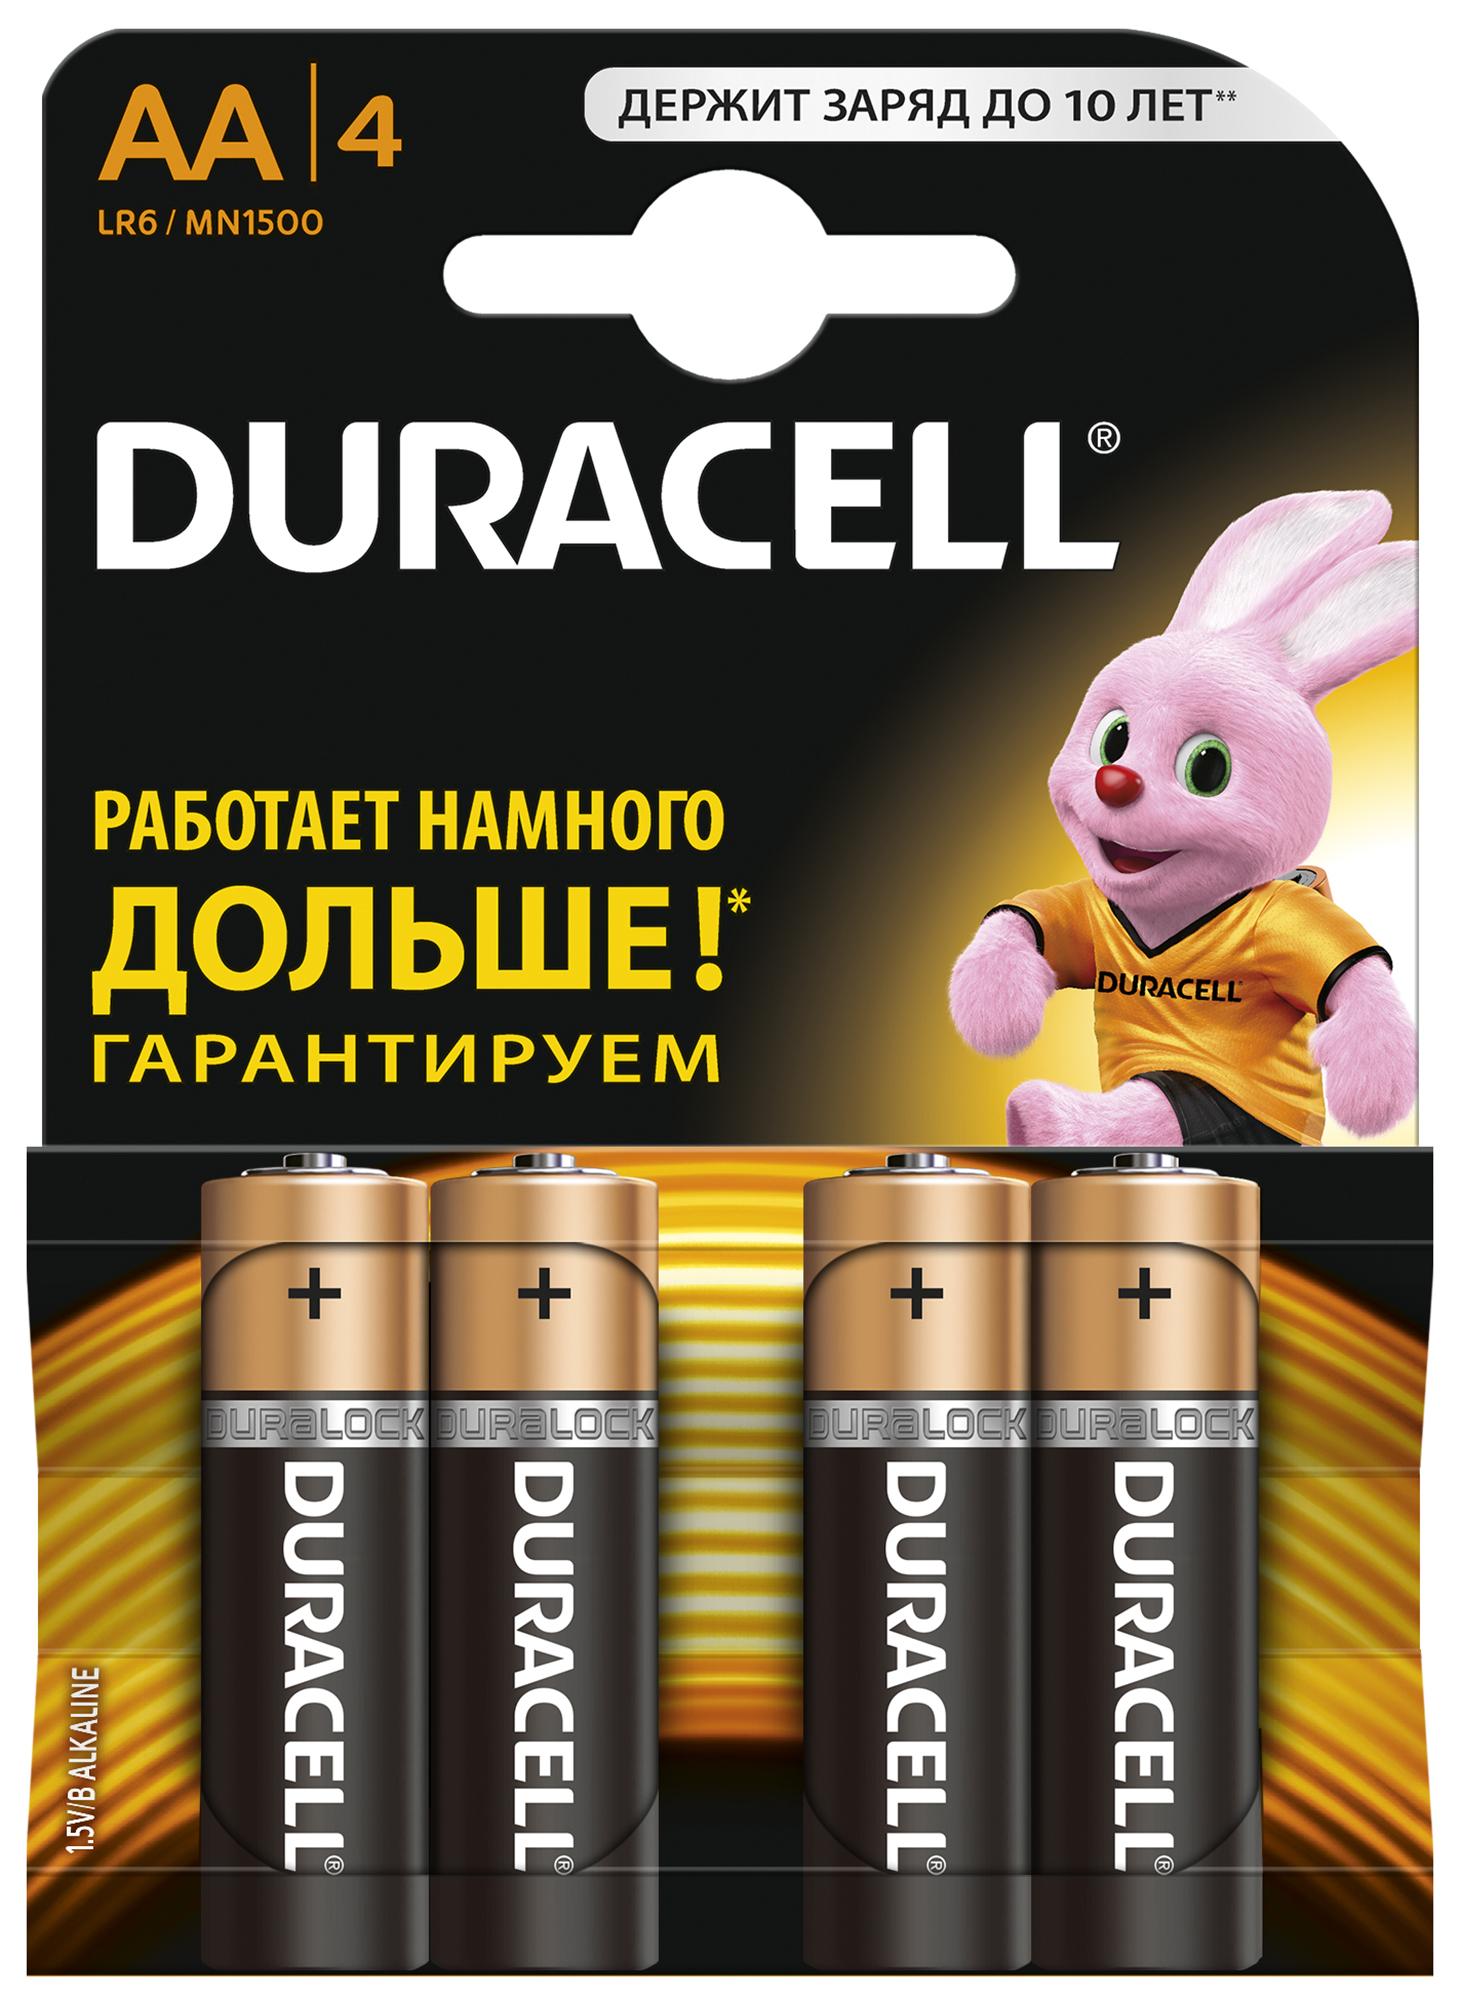 Duracell Батарейки щелочные Duracell Basic AA/LR06, 4 шт.  батарейки aa lr6 4шт duracell щелочные basic